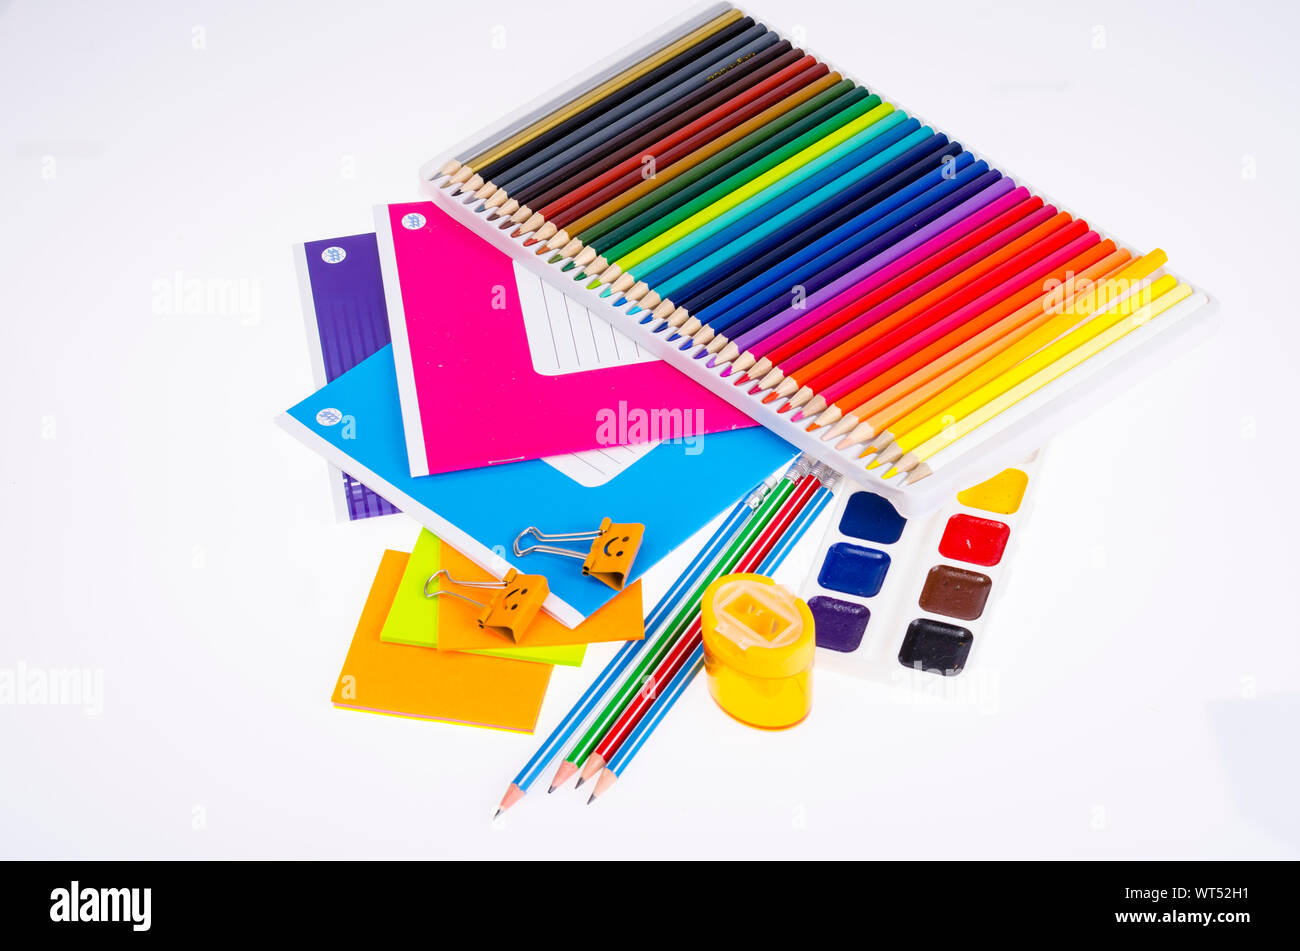 School items and student accessories. Studio Photo. Stock Photo